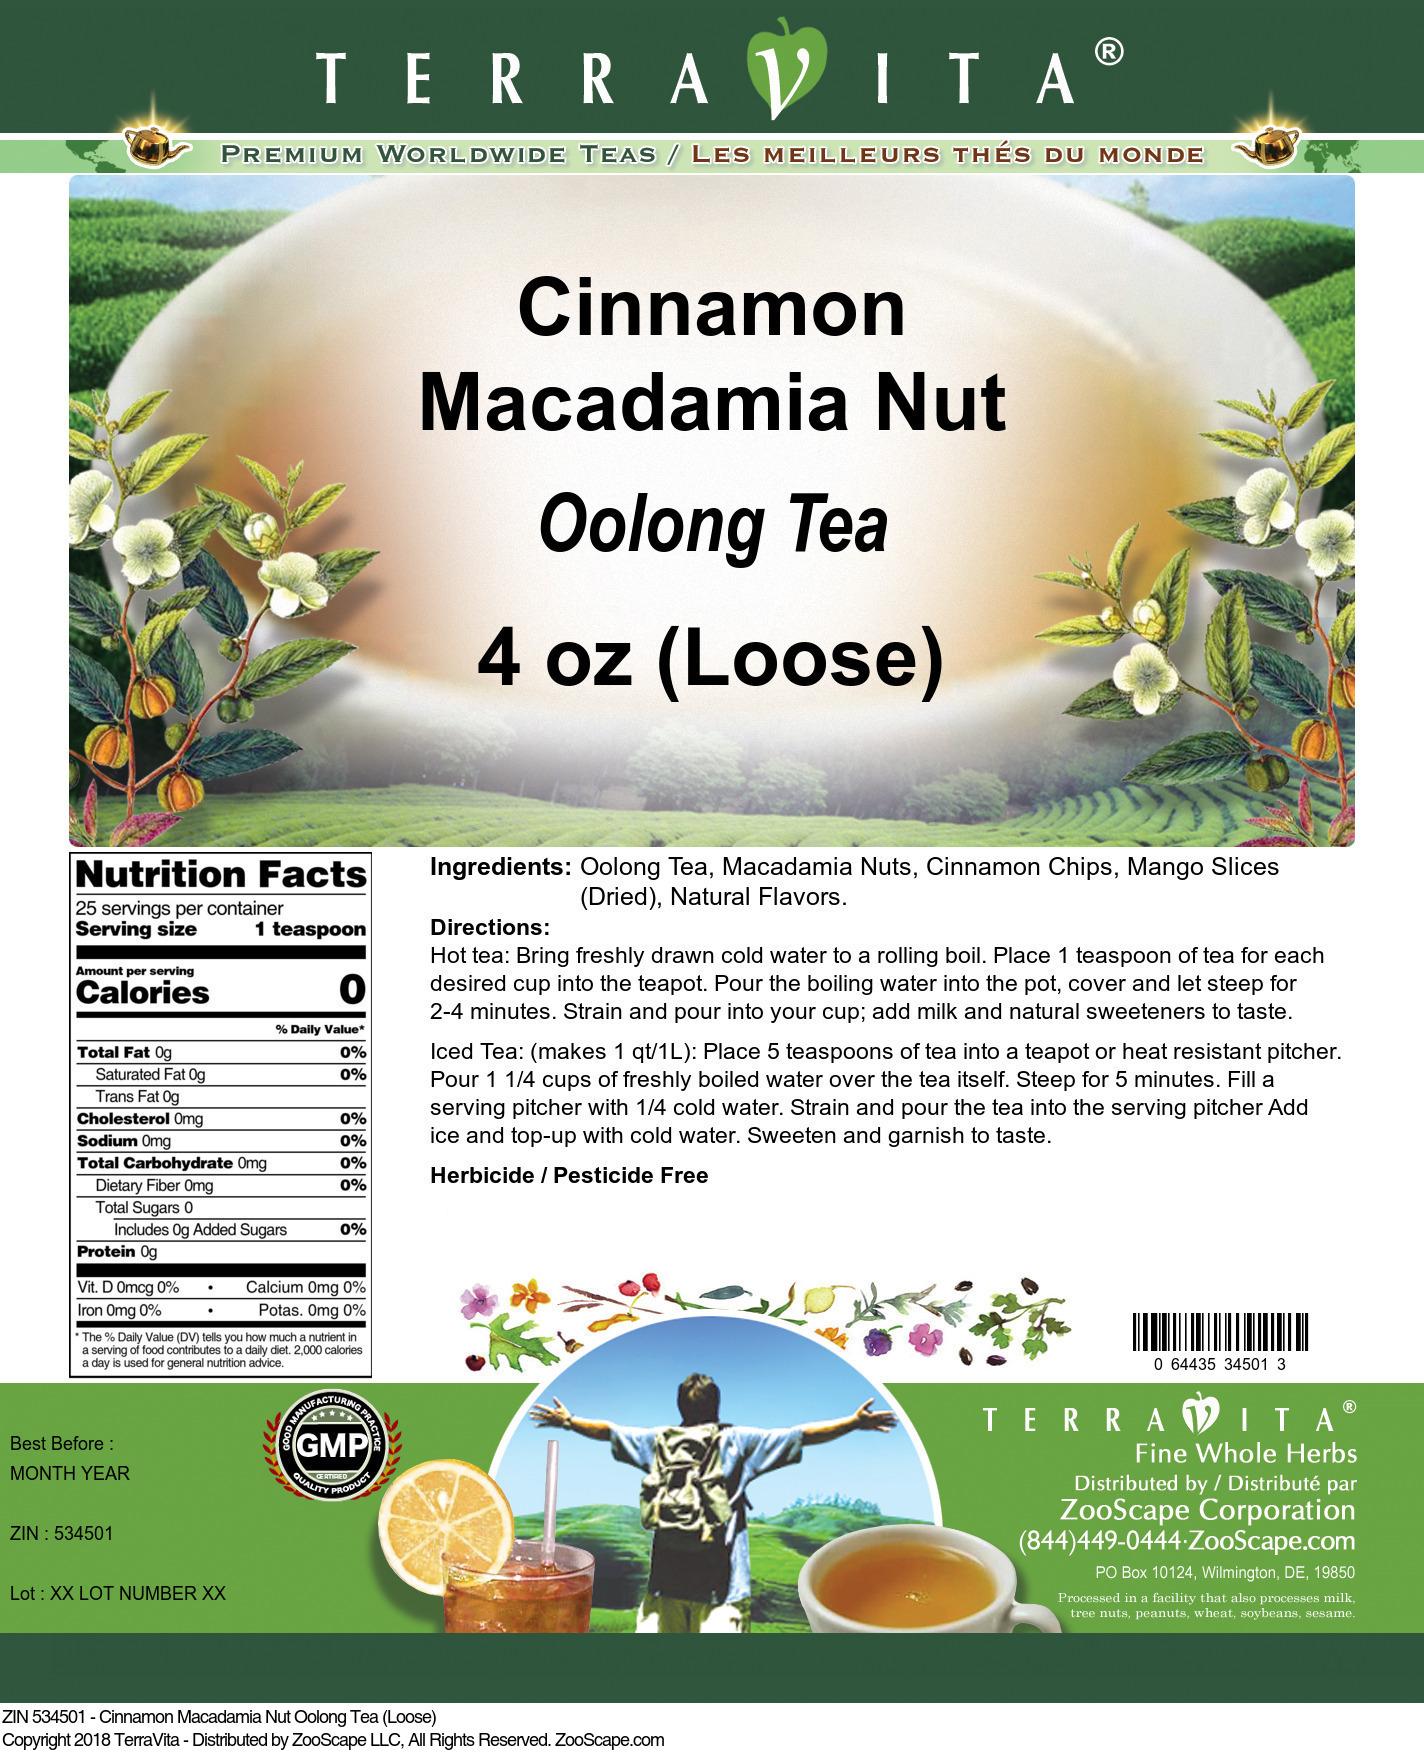 Cinnamon Macadamia Nut Oolong Tea